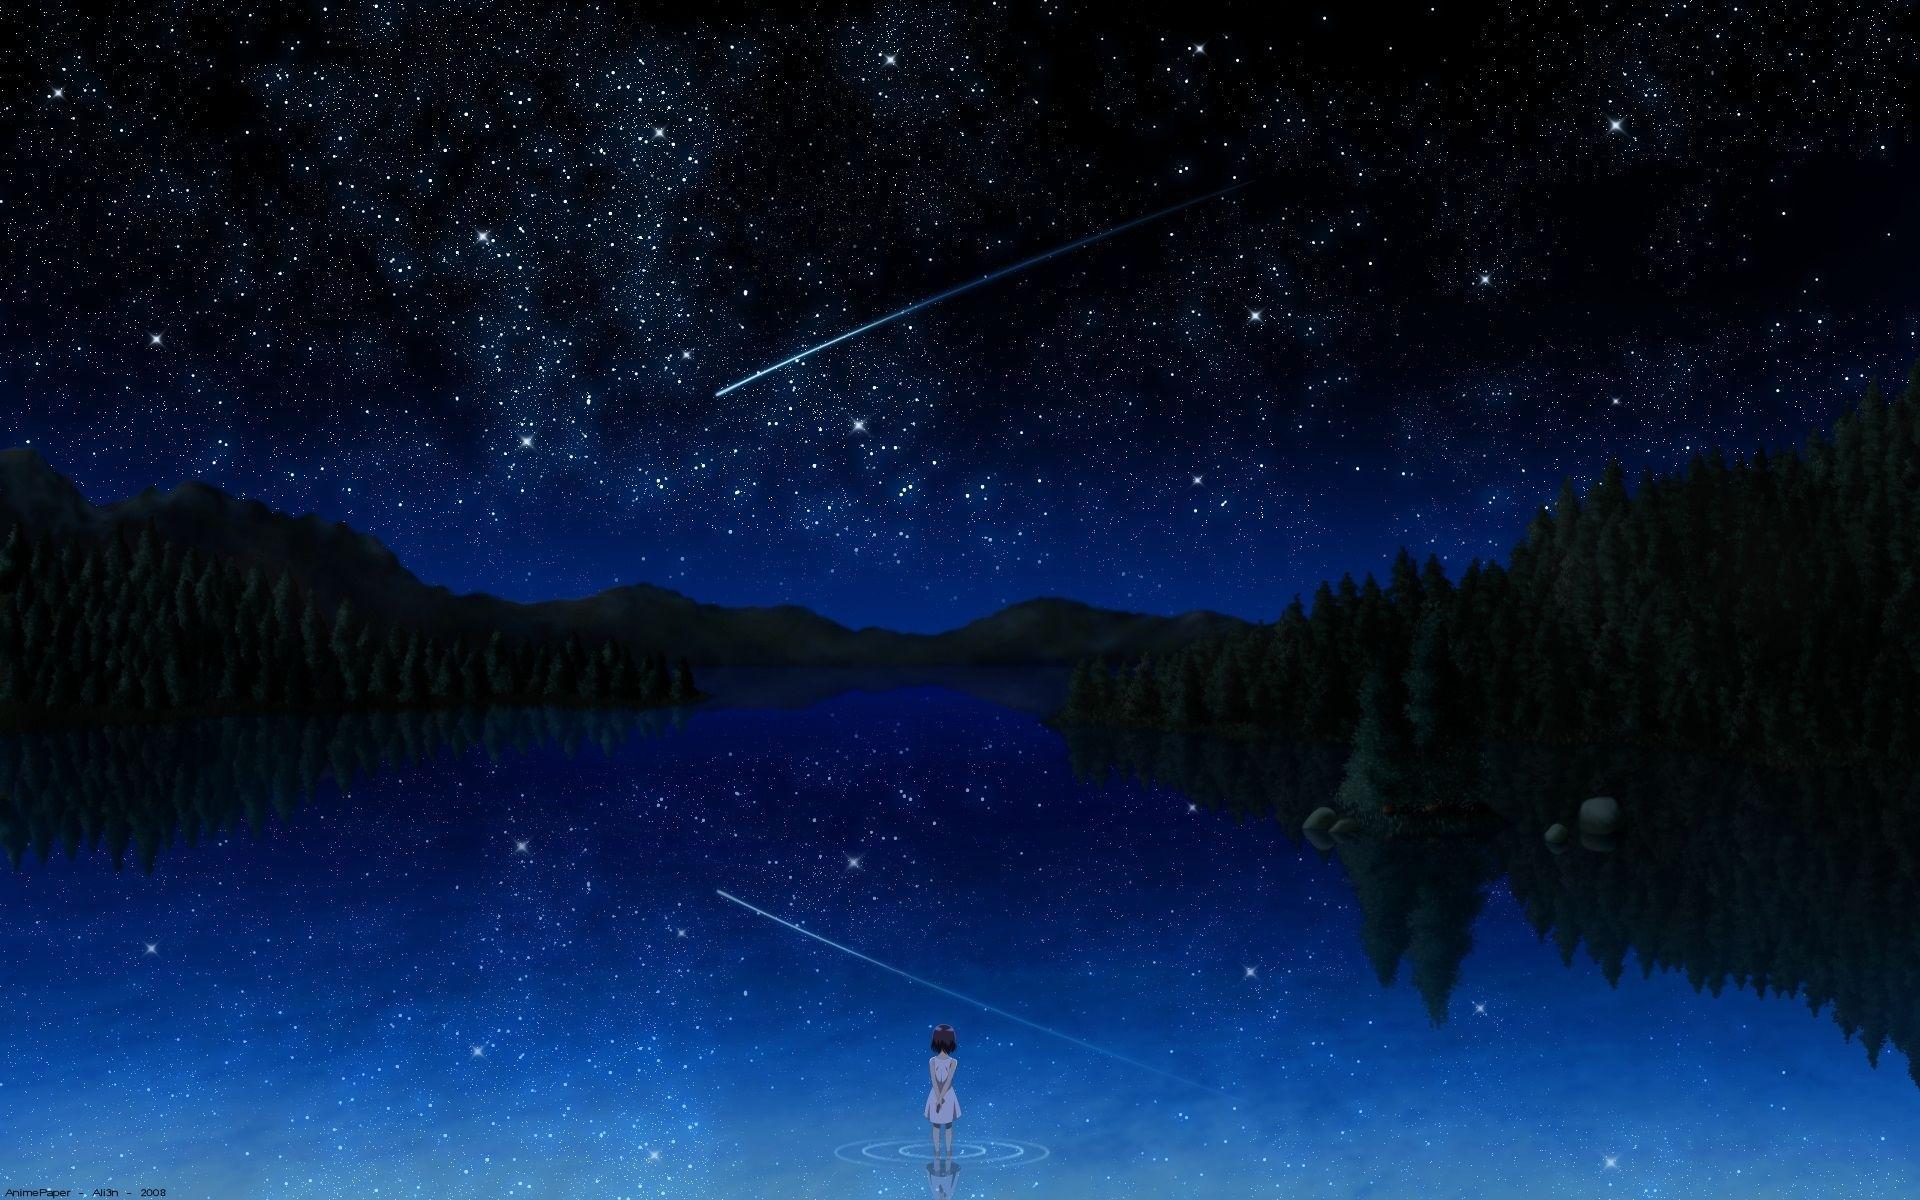 Dark Anime Wallpapers Wallpaper Cave Аниме пейзажи